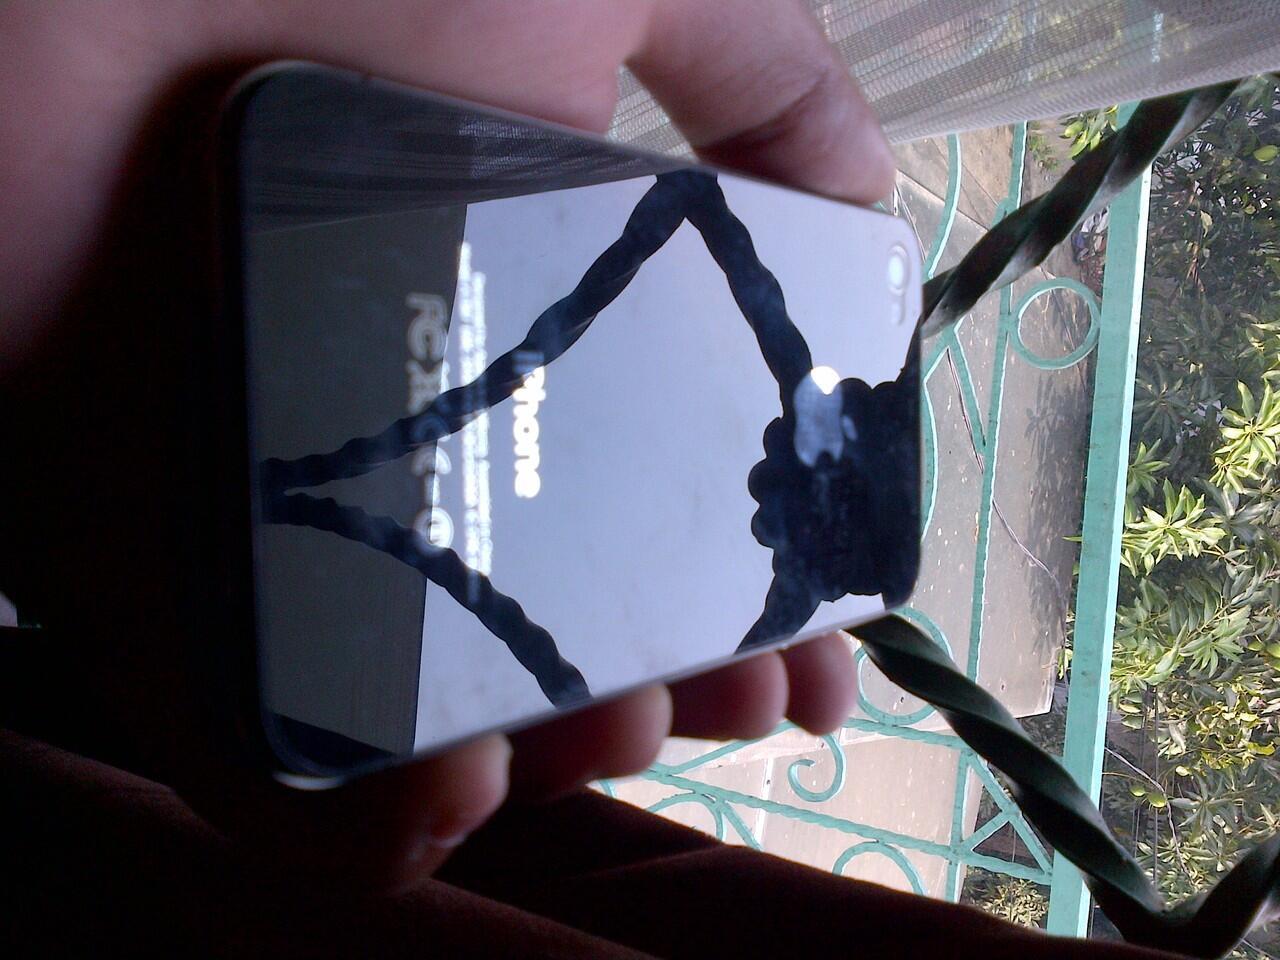 Jual Iphone 4S 16 GB Black Muluszt Bergaransi